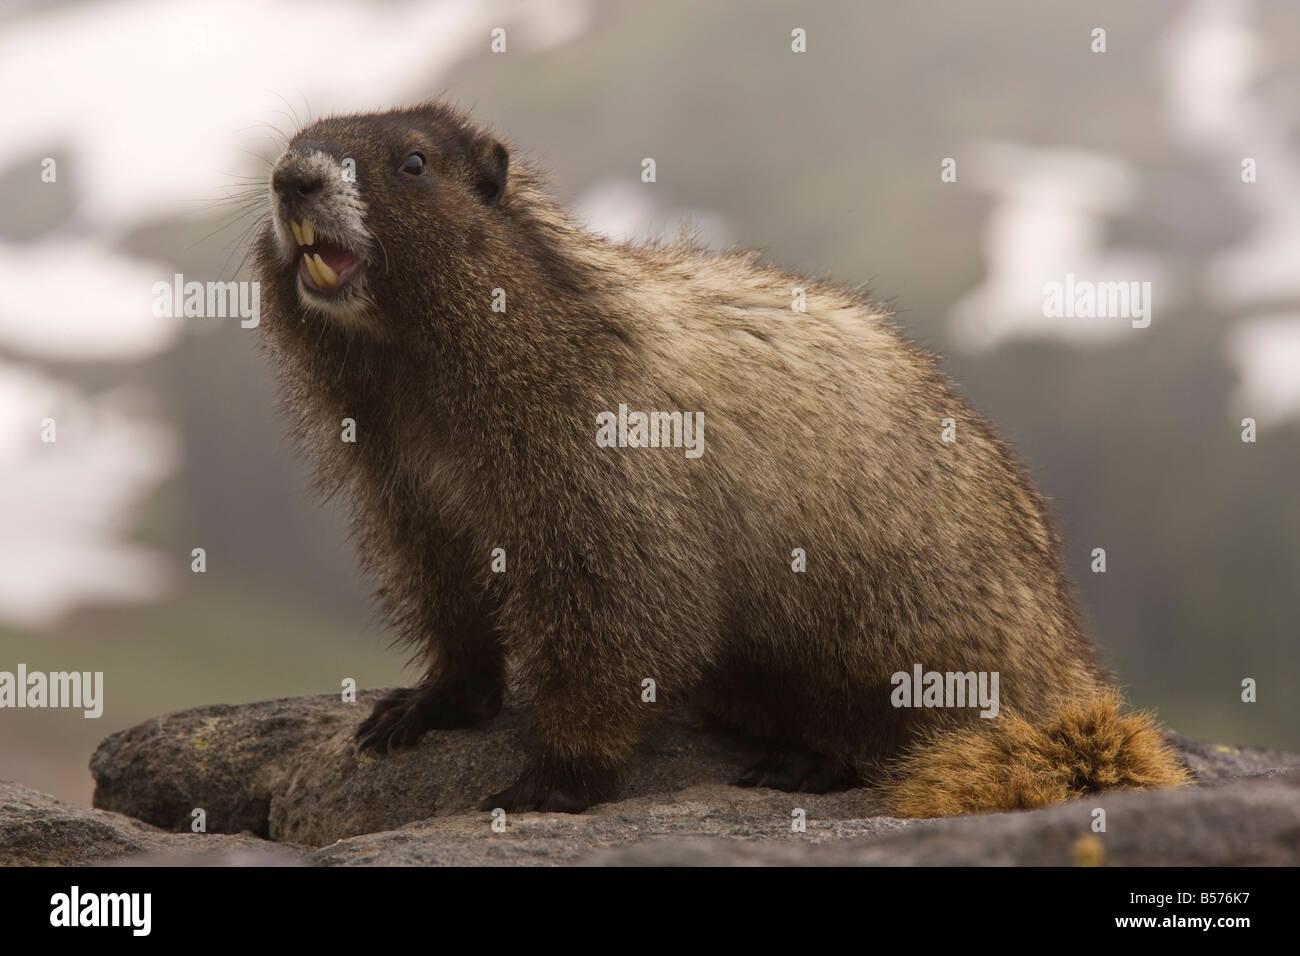 Hoary marmot Marmota caligata on Mount Rainier Cascade Mountains Washington - Stock Image